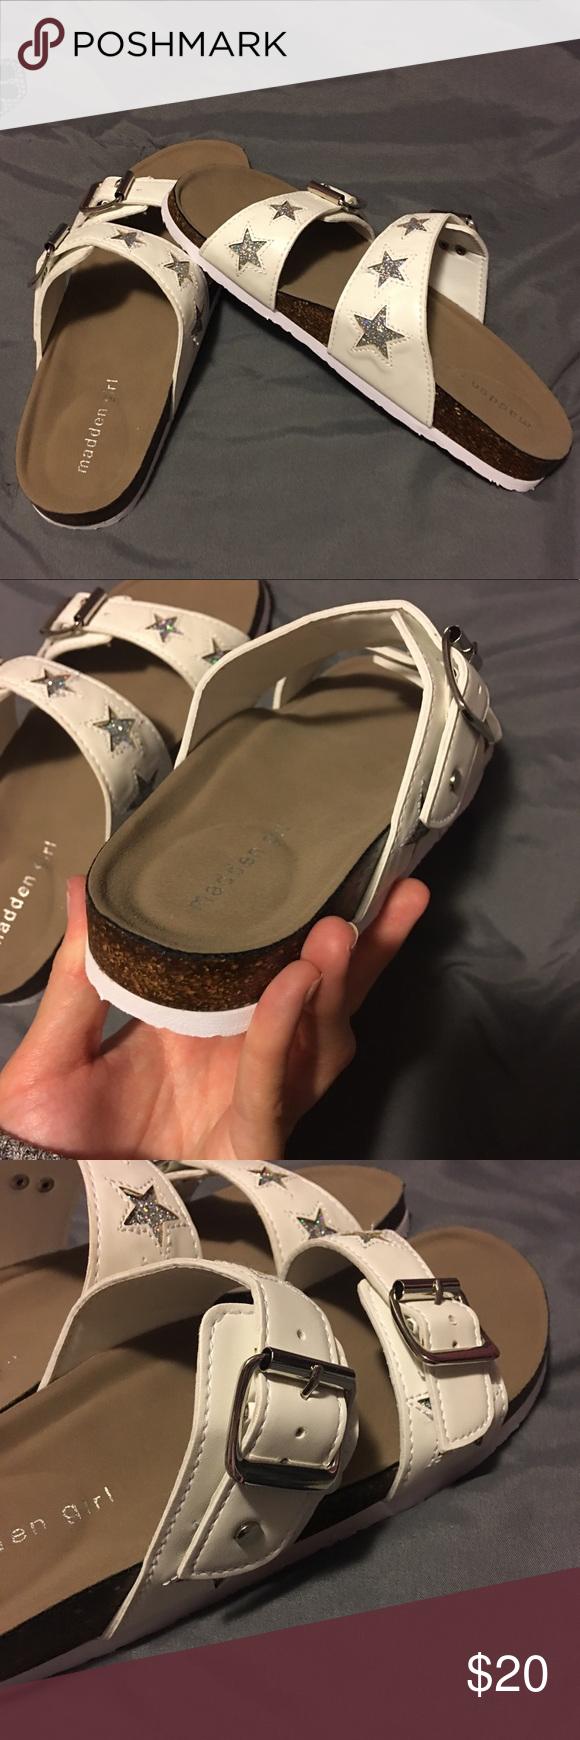 4e2e6e082bd Madden Girl White   Glitter Stars Footbed Sandals Brand new never worn!  Fits true to size Madden Girl Shoes Sandals